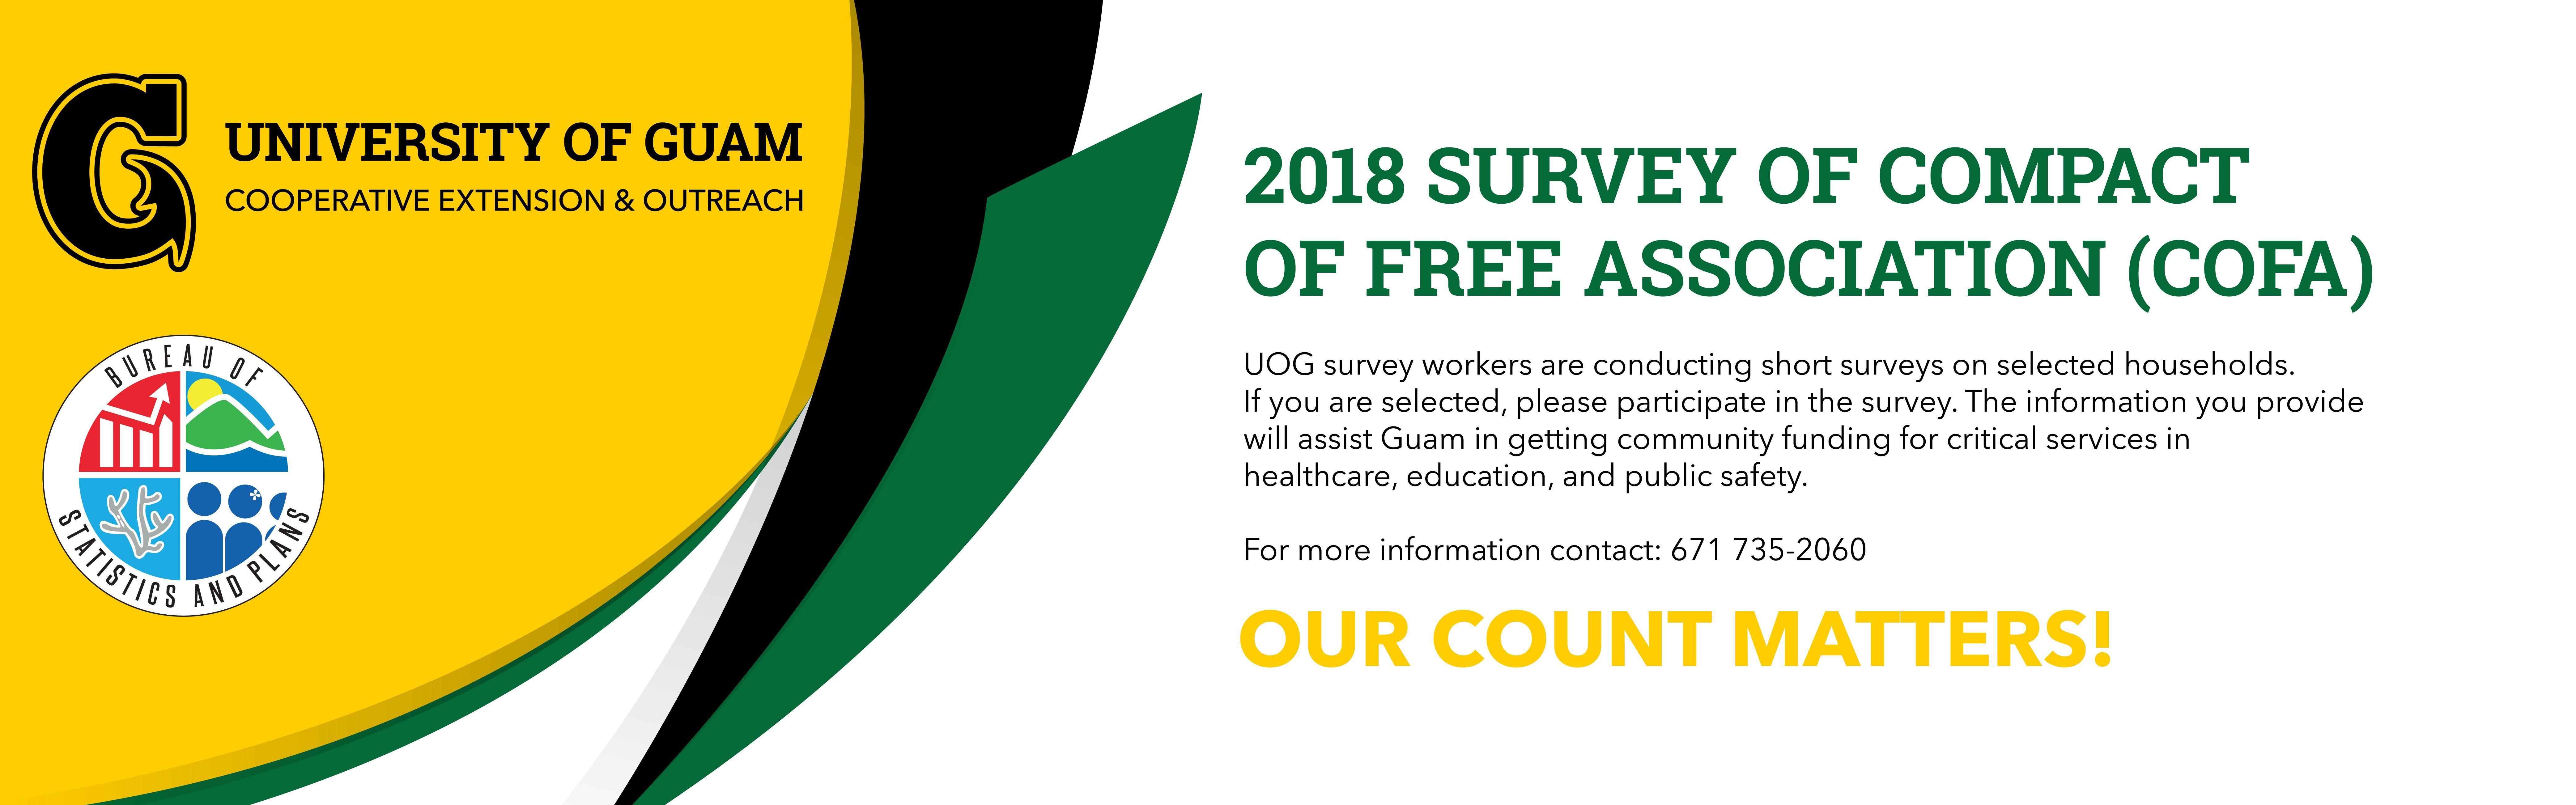 COFA Survey for 2018